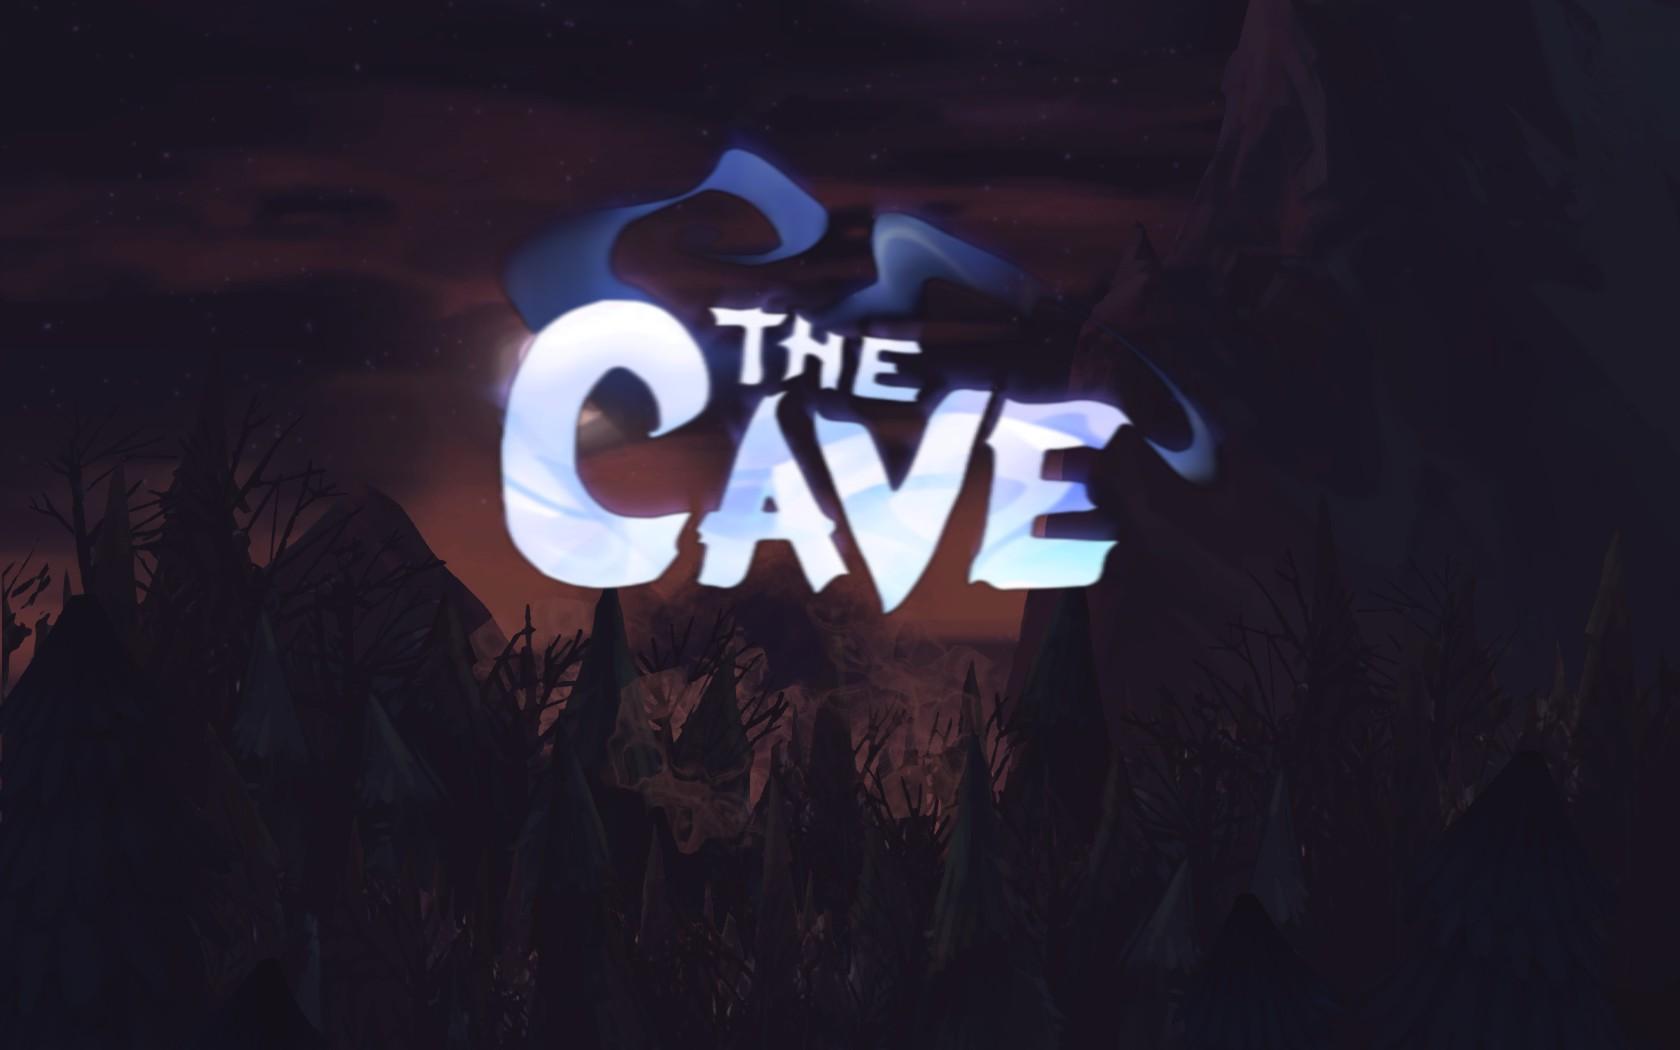 The Cave Screenshot Wallpaper Title Screen